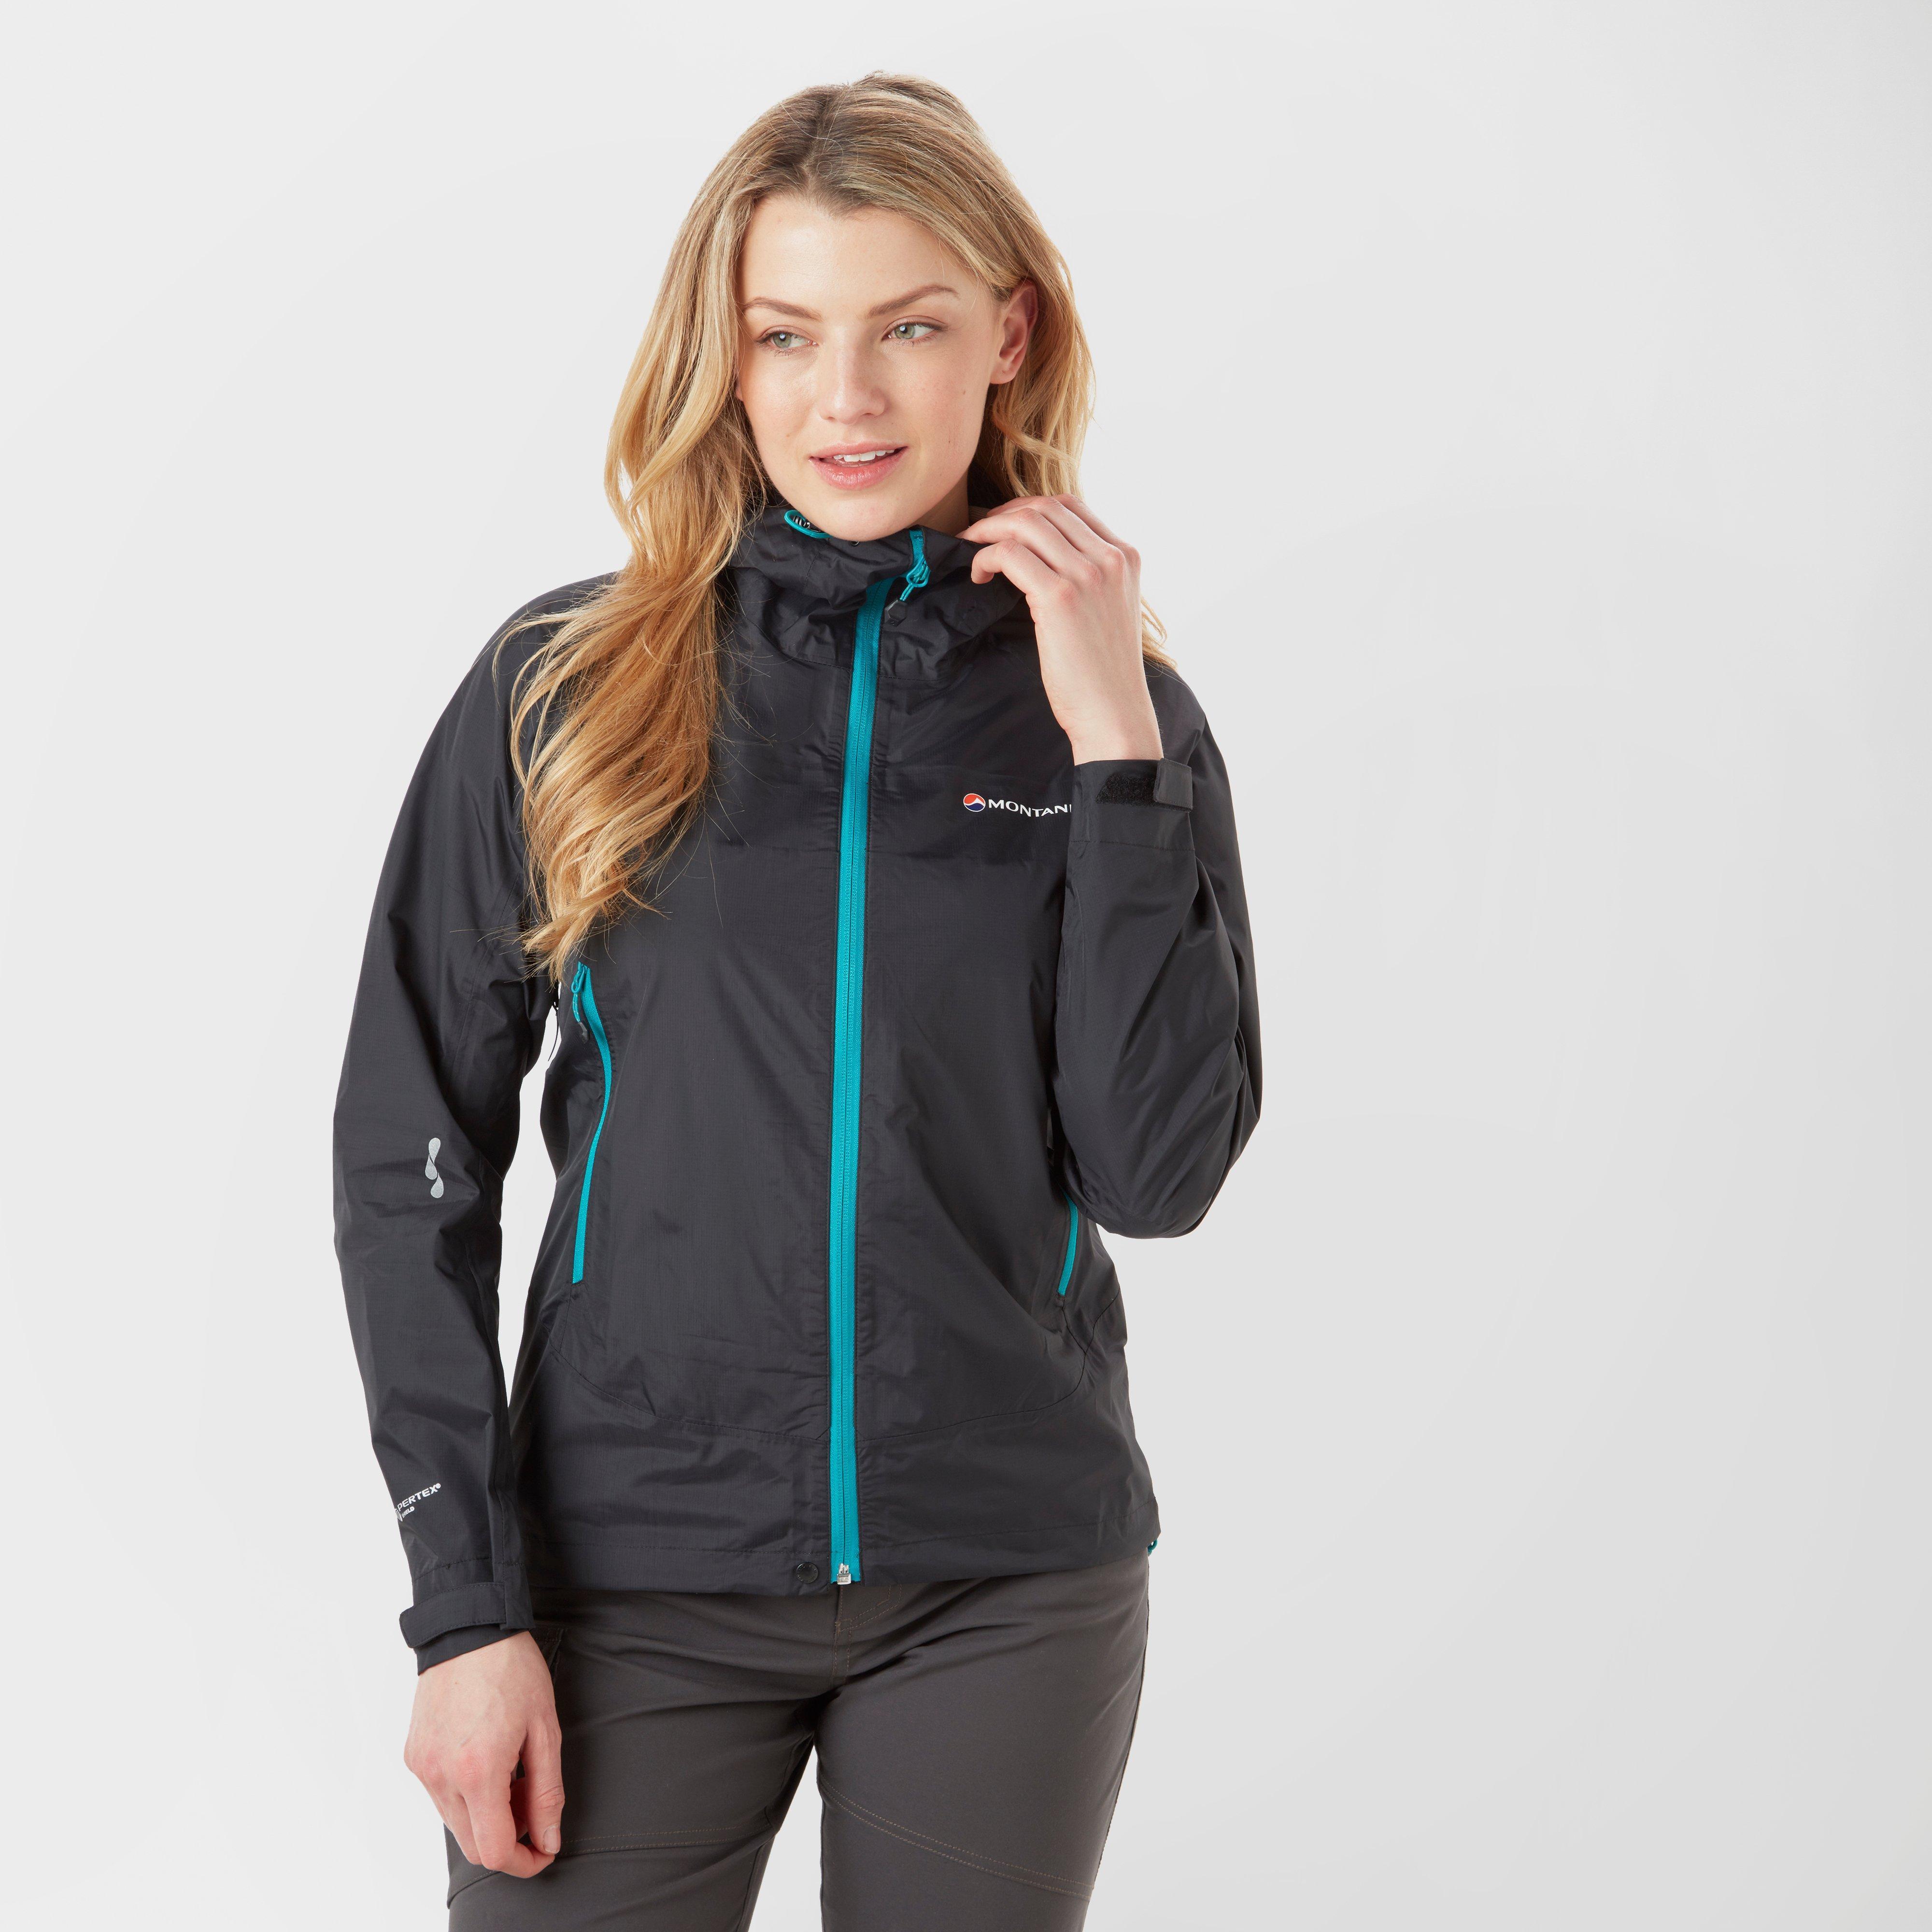 Montane Montane womens Atomic Waterproof Jacket - Black, Black